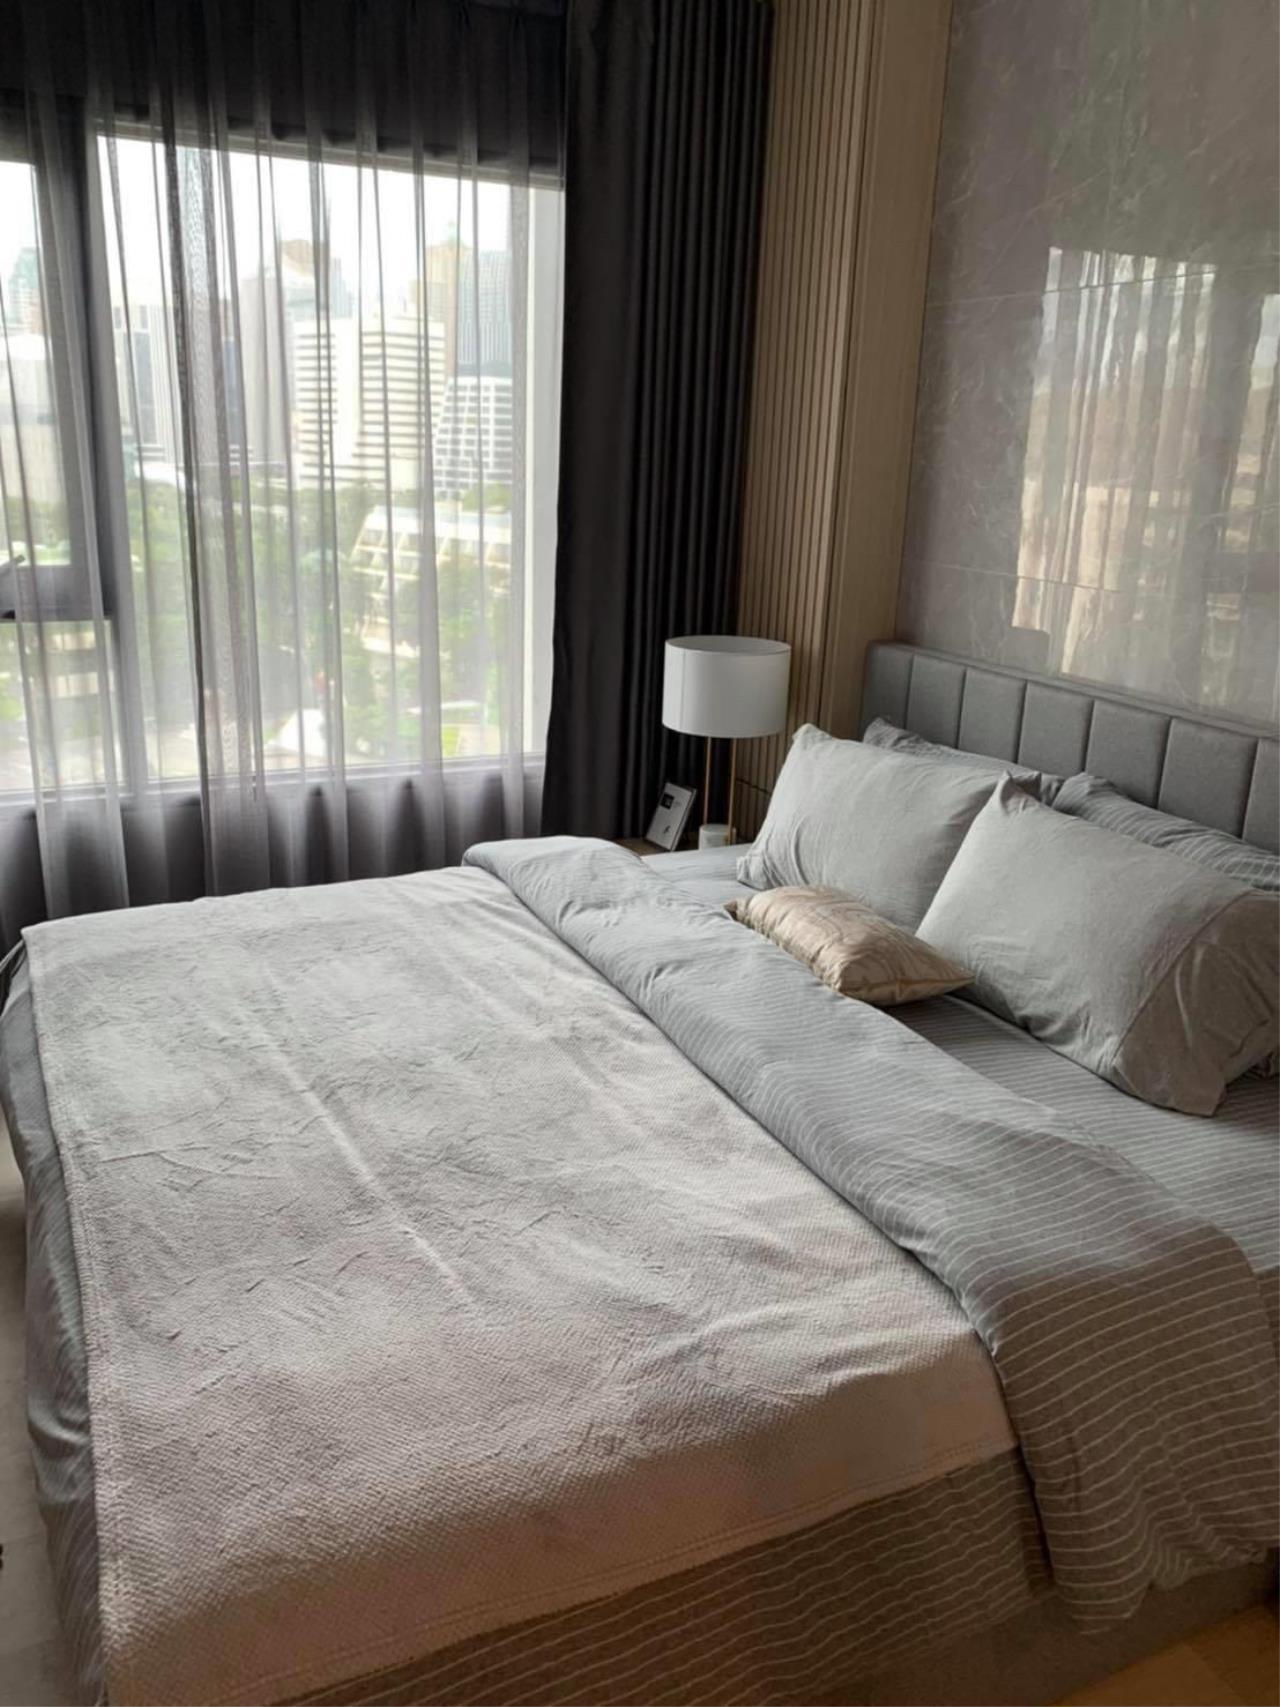 Agent - Phapayawarin Agency's Life One Wireless for Rent, 1 Bedroom 1 Bathroom, 35 Sq.m., BTS Phloenchit 7